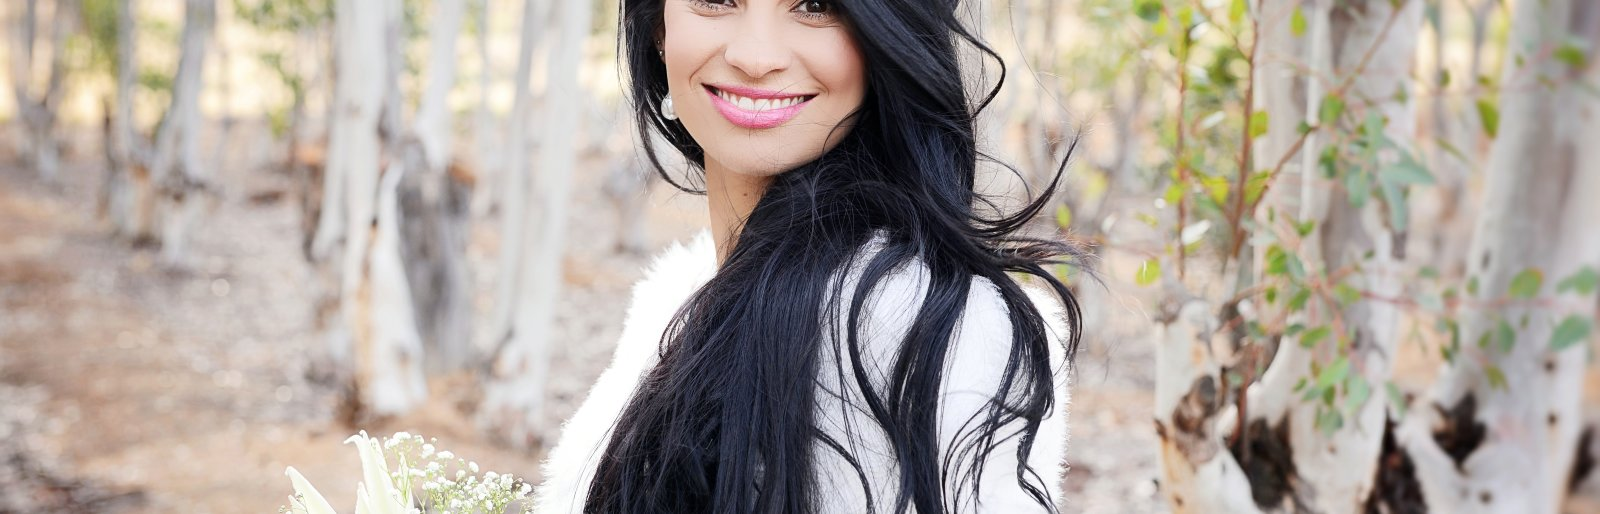 Adelaide De Villiers